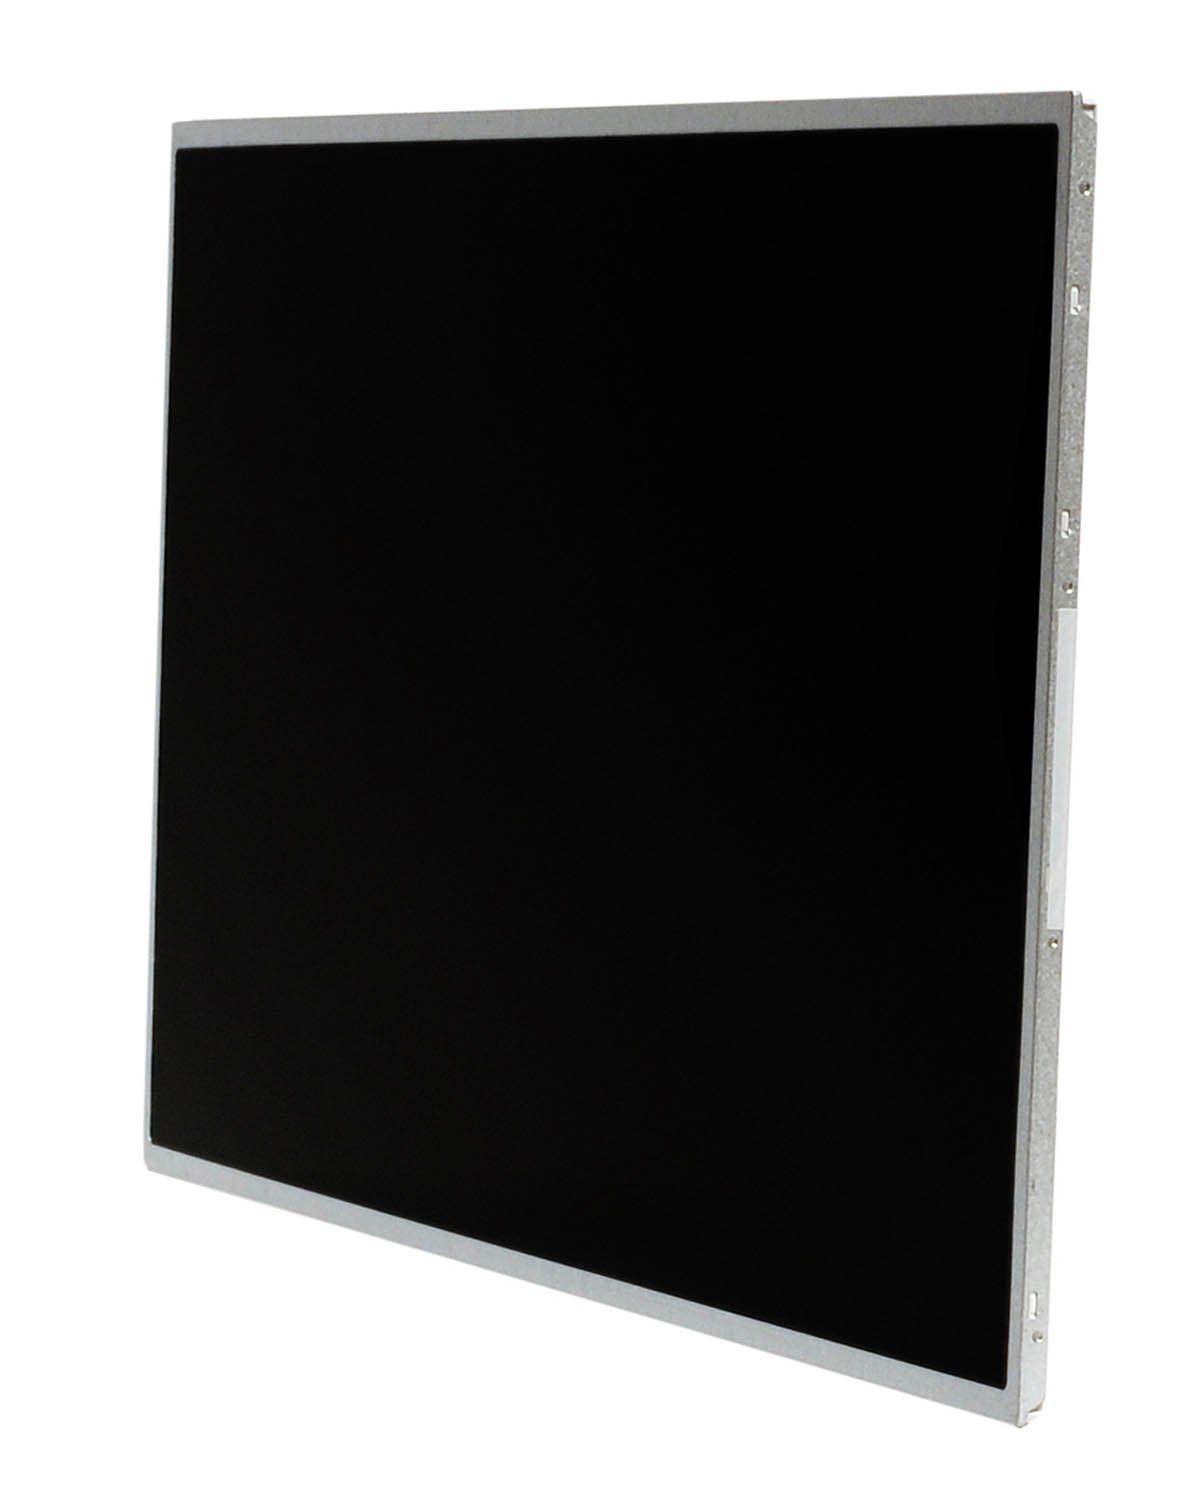 QuYing Ordinateur Portable LCD Écran pour Acer ASPIRE V3-551 V3-551G SERIES (15.6 pouce 1366x768 30pin TK)